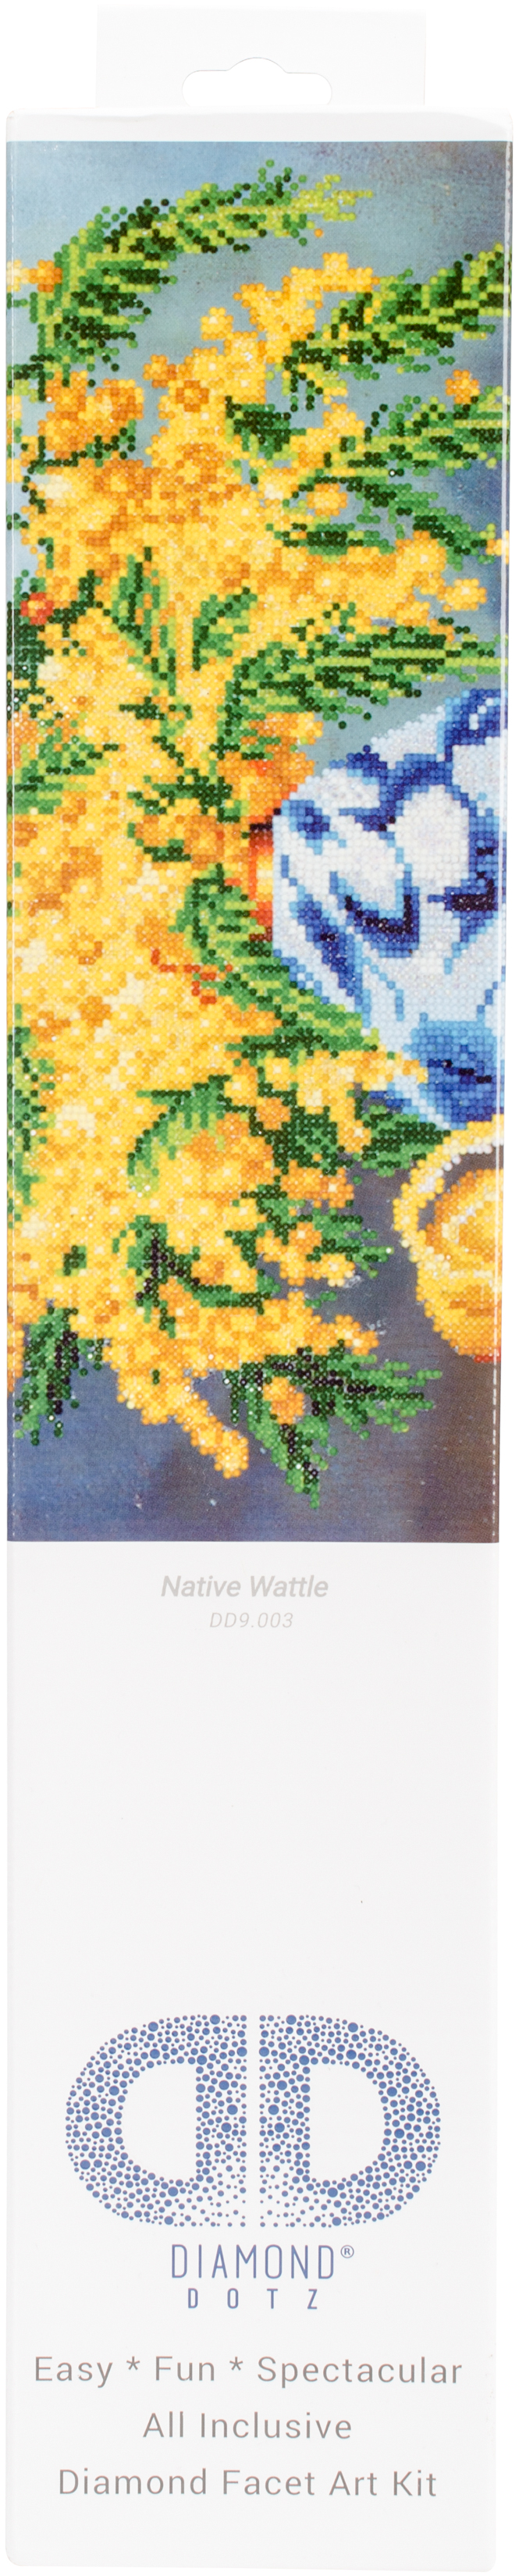 Diamond Dotz Diamond Embroidery Facet Art Kit 19.5X23.5-Native Wattle